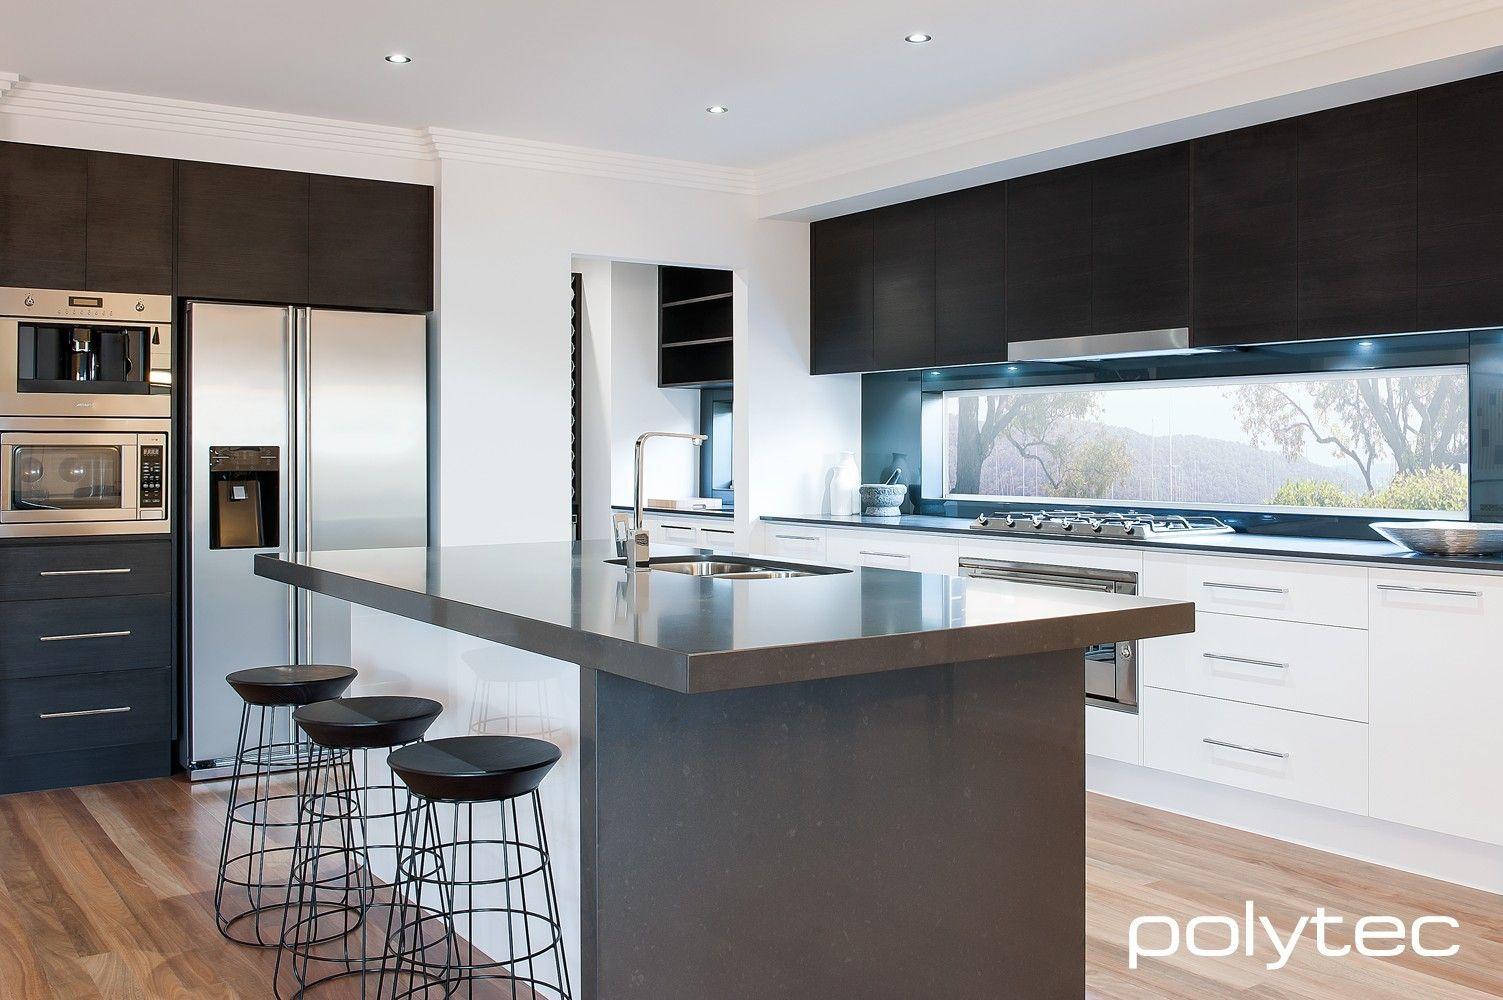 Wenge Wood Kitchen Cabinets Doors In Createc Alabaster Overhead Cupboards In Ravine Black